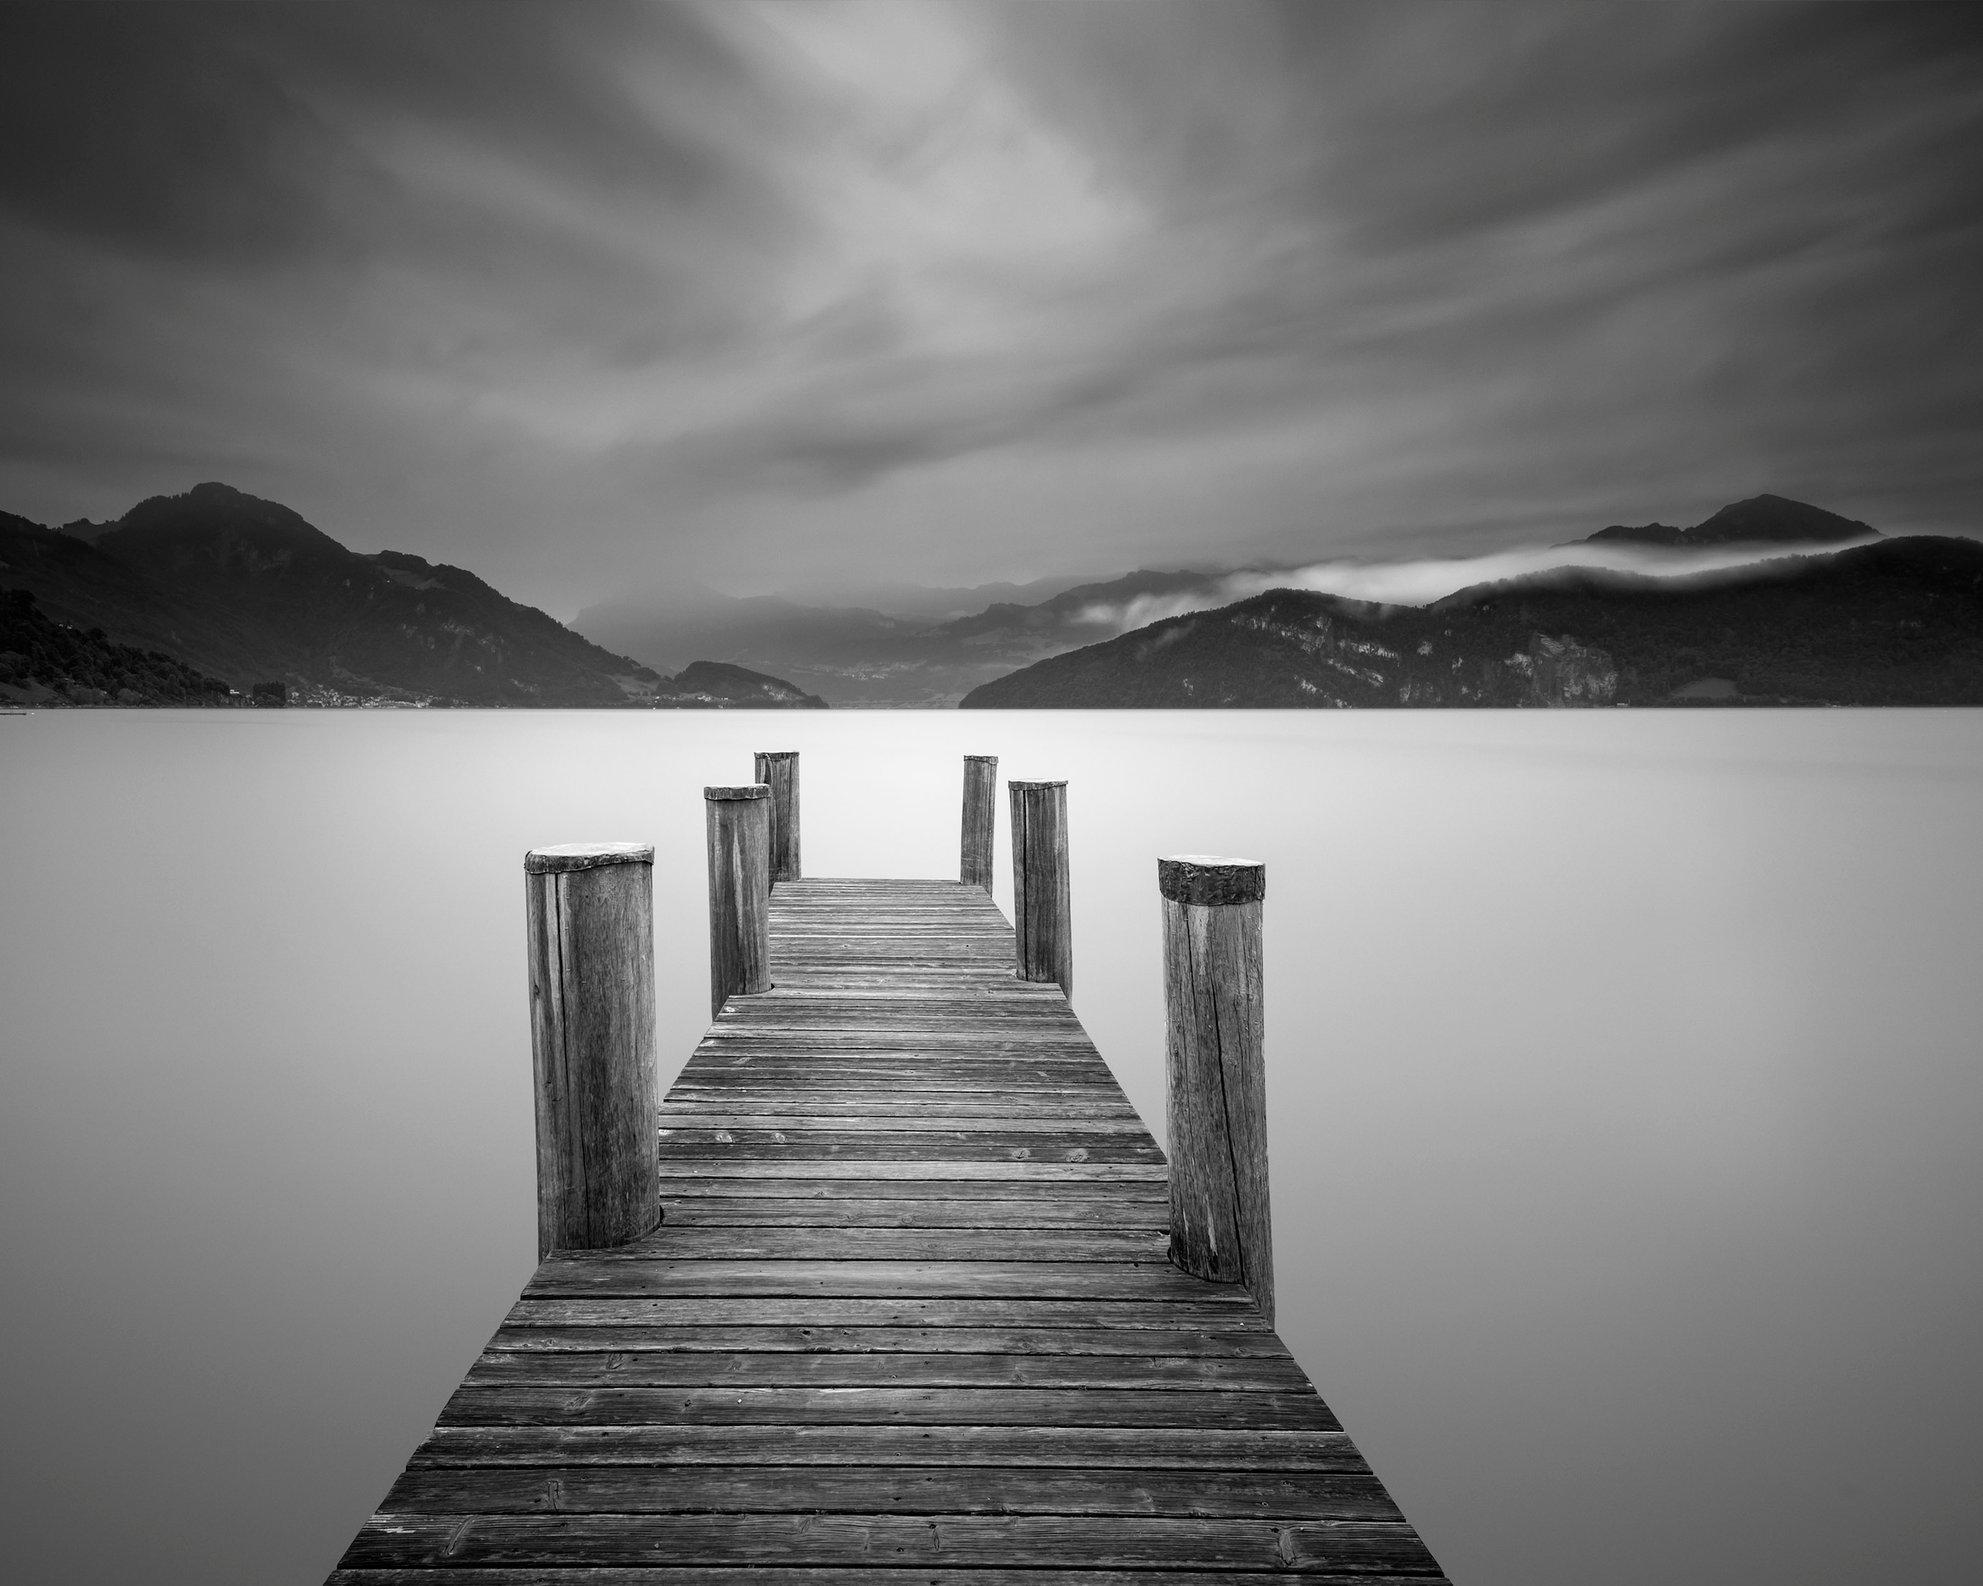 Jetty on Lake Lucerne, Switzerland